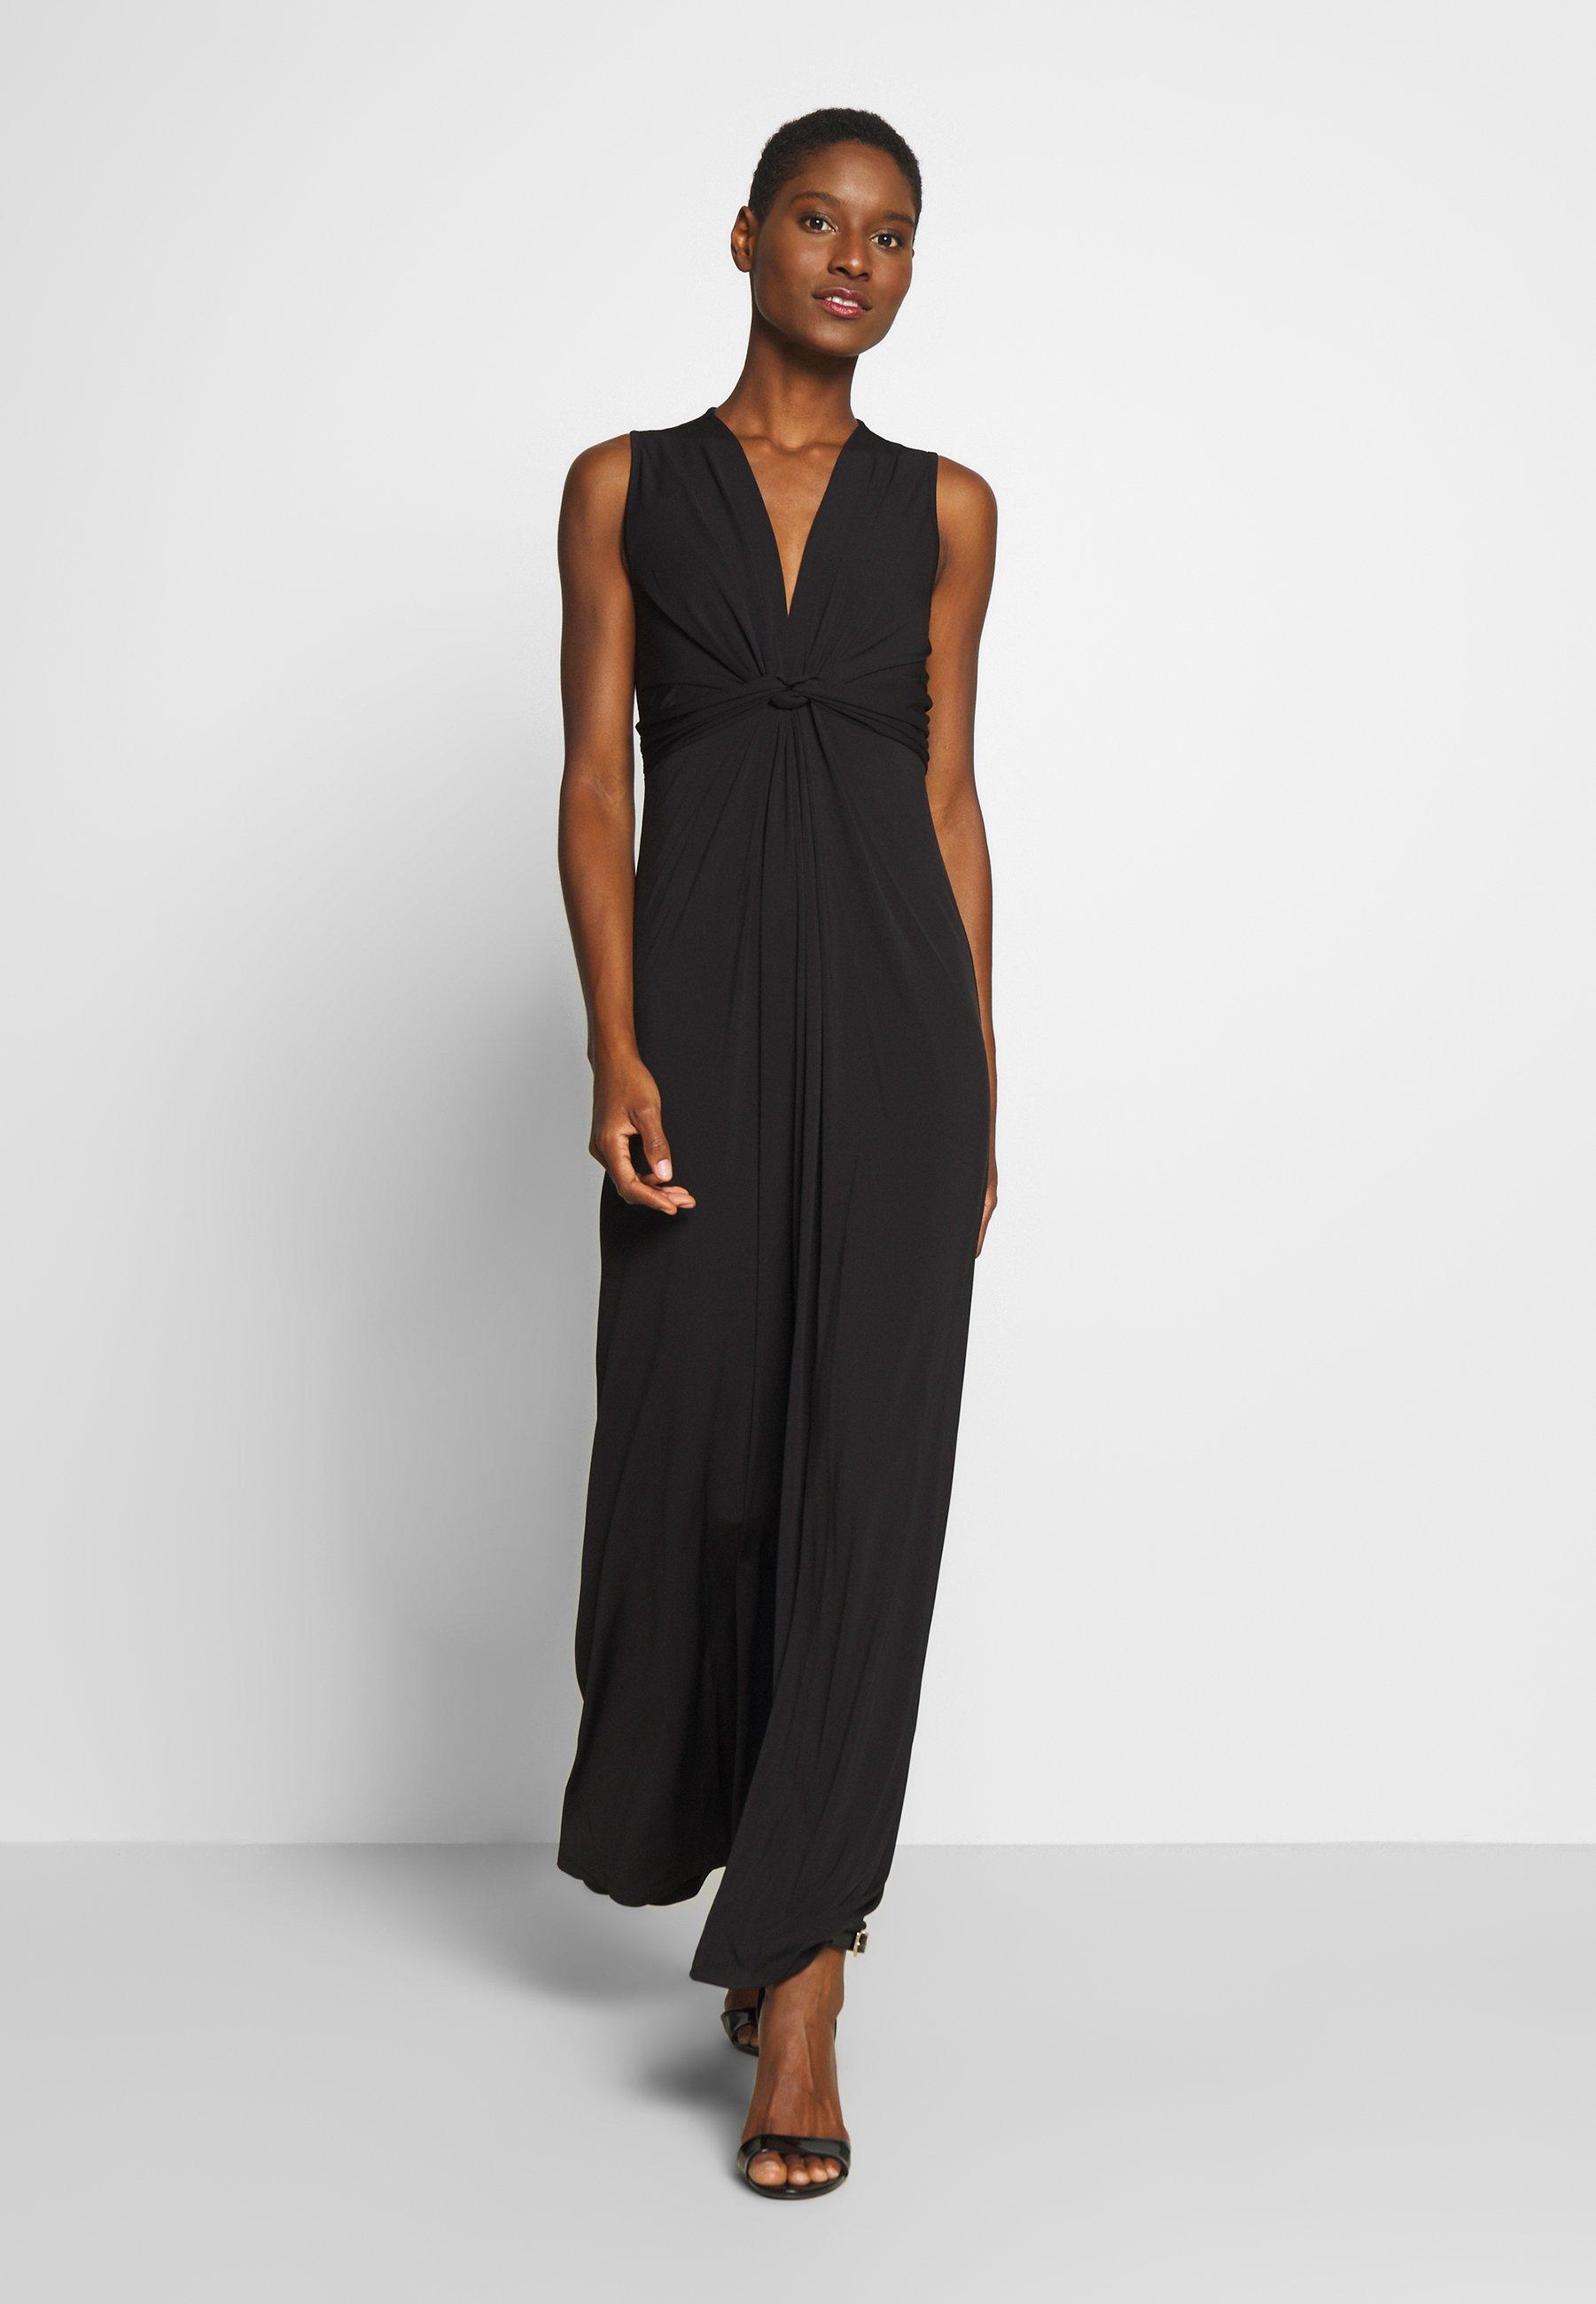 Mujer BASIC - FRONT KNOT MAXI DRESS - Vestido largo